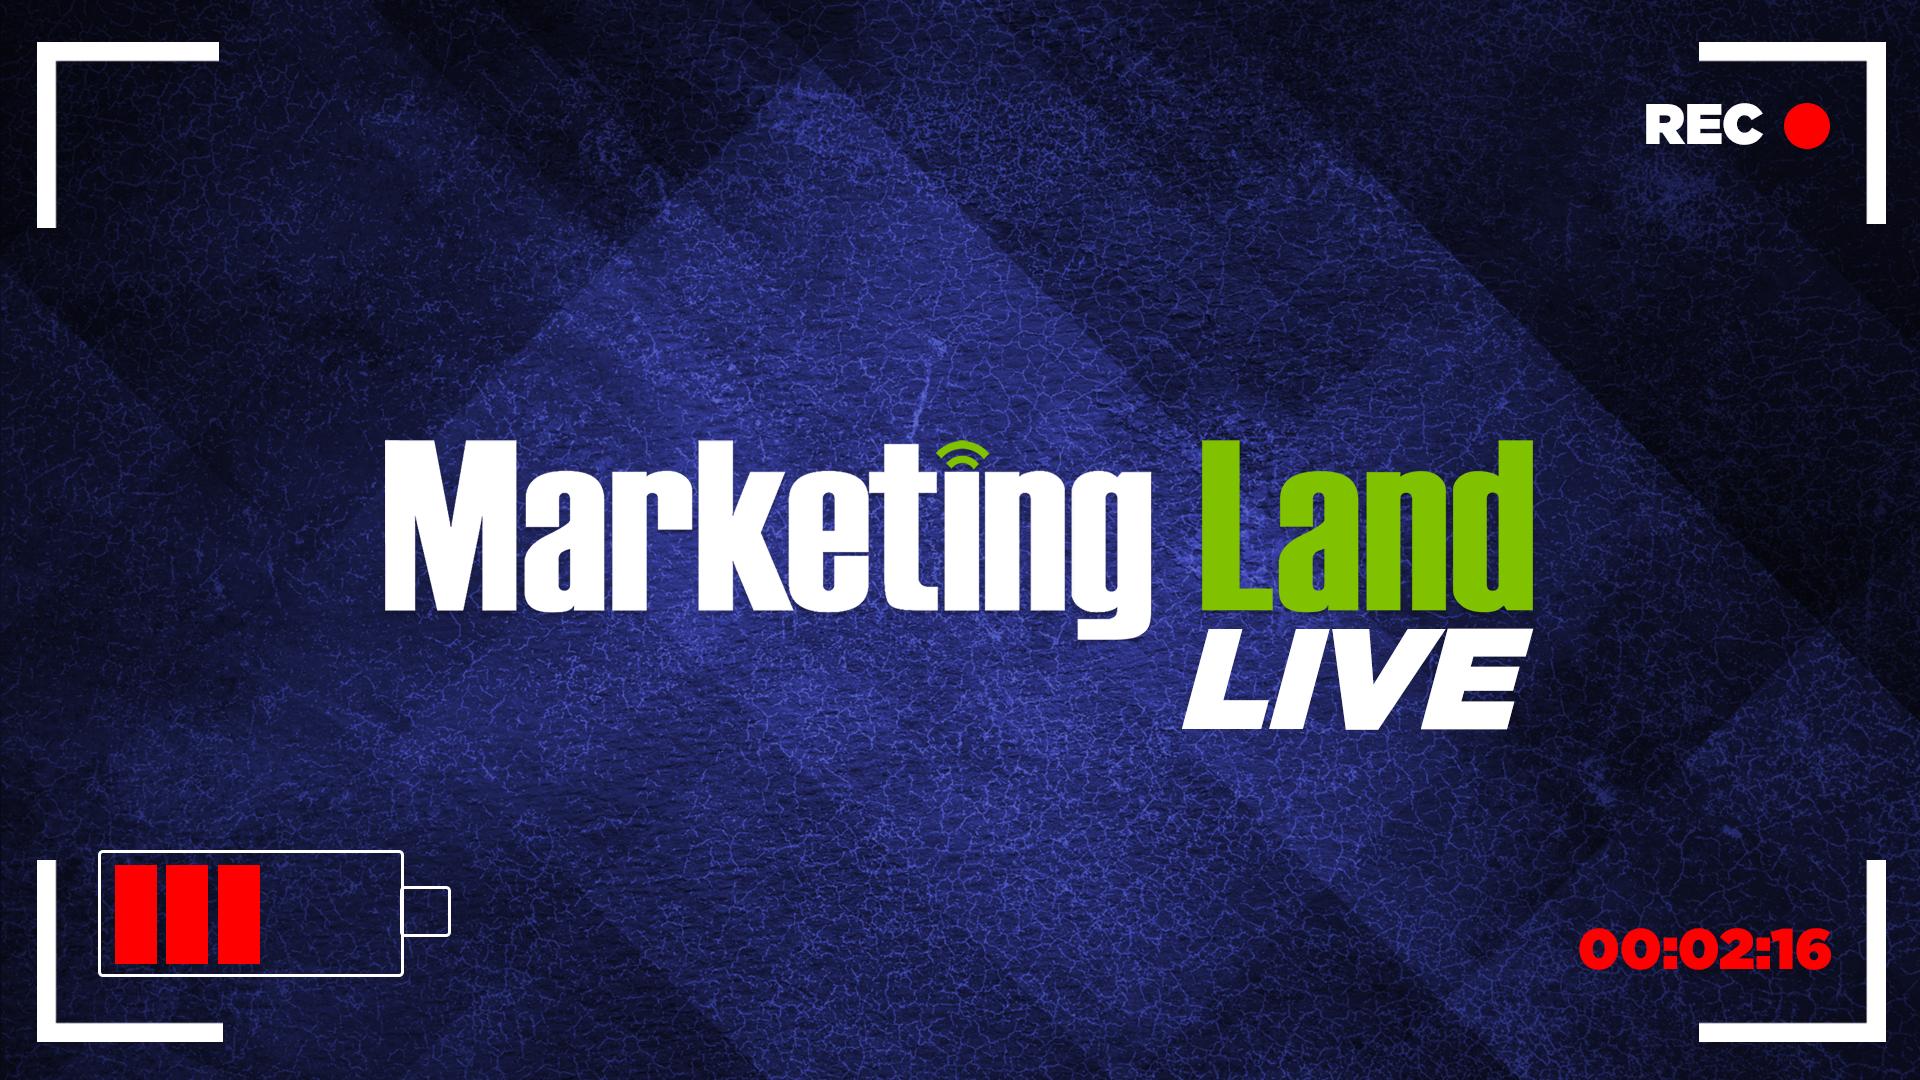 ML-live-logo-1920